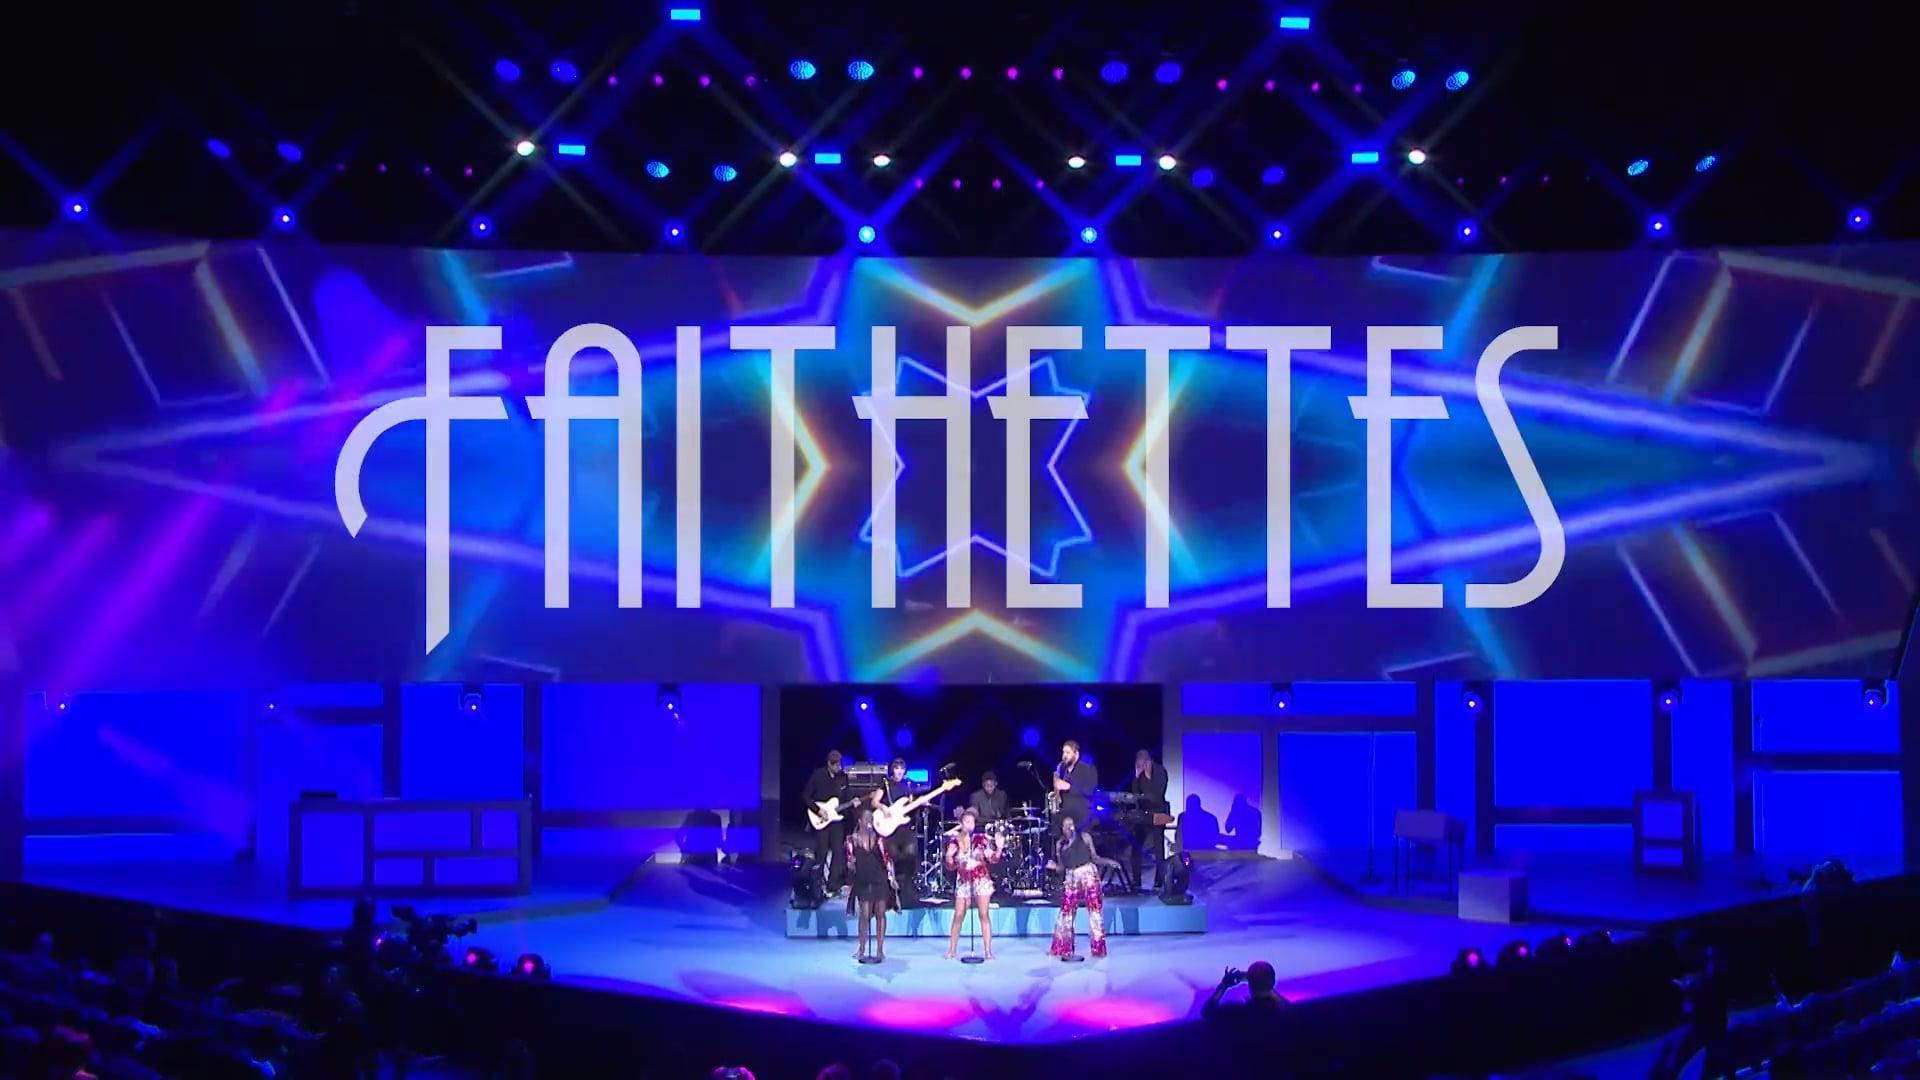 FAITHETTES Crazy in love_ showreel band